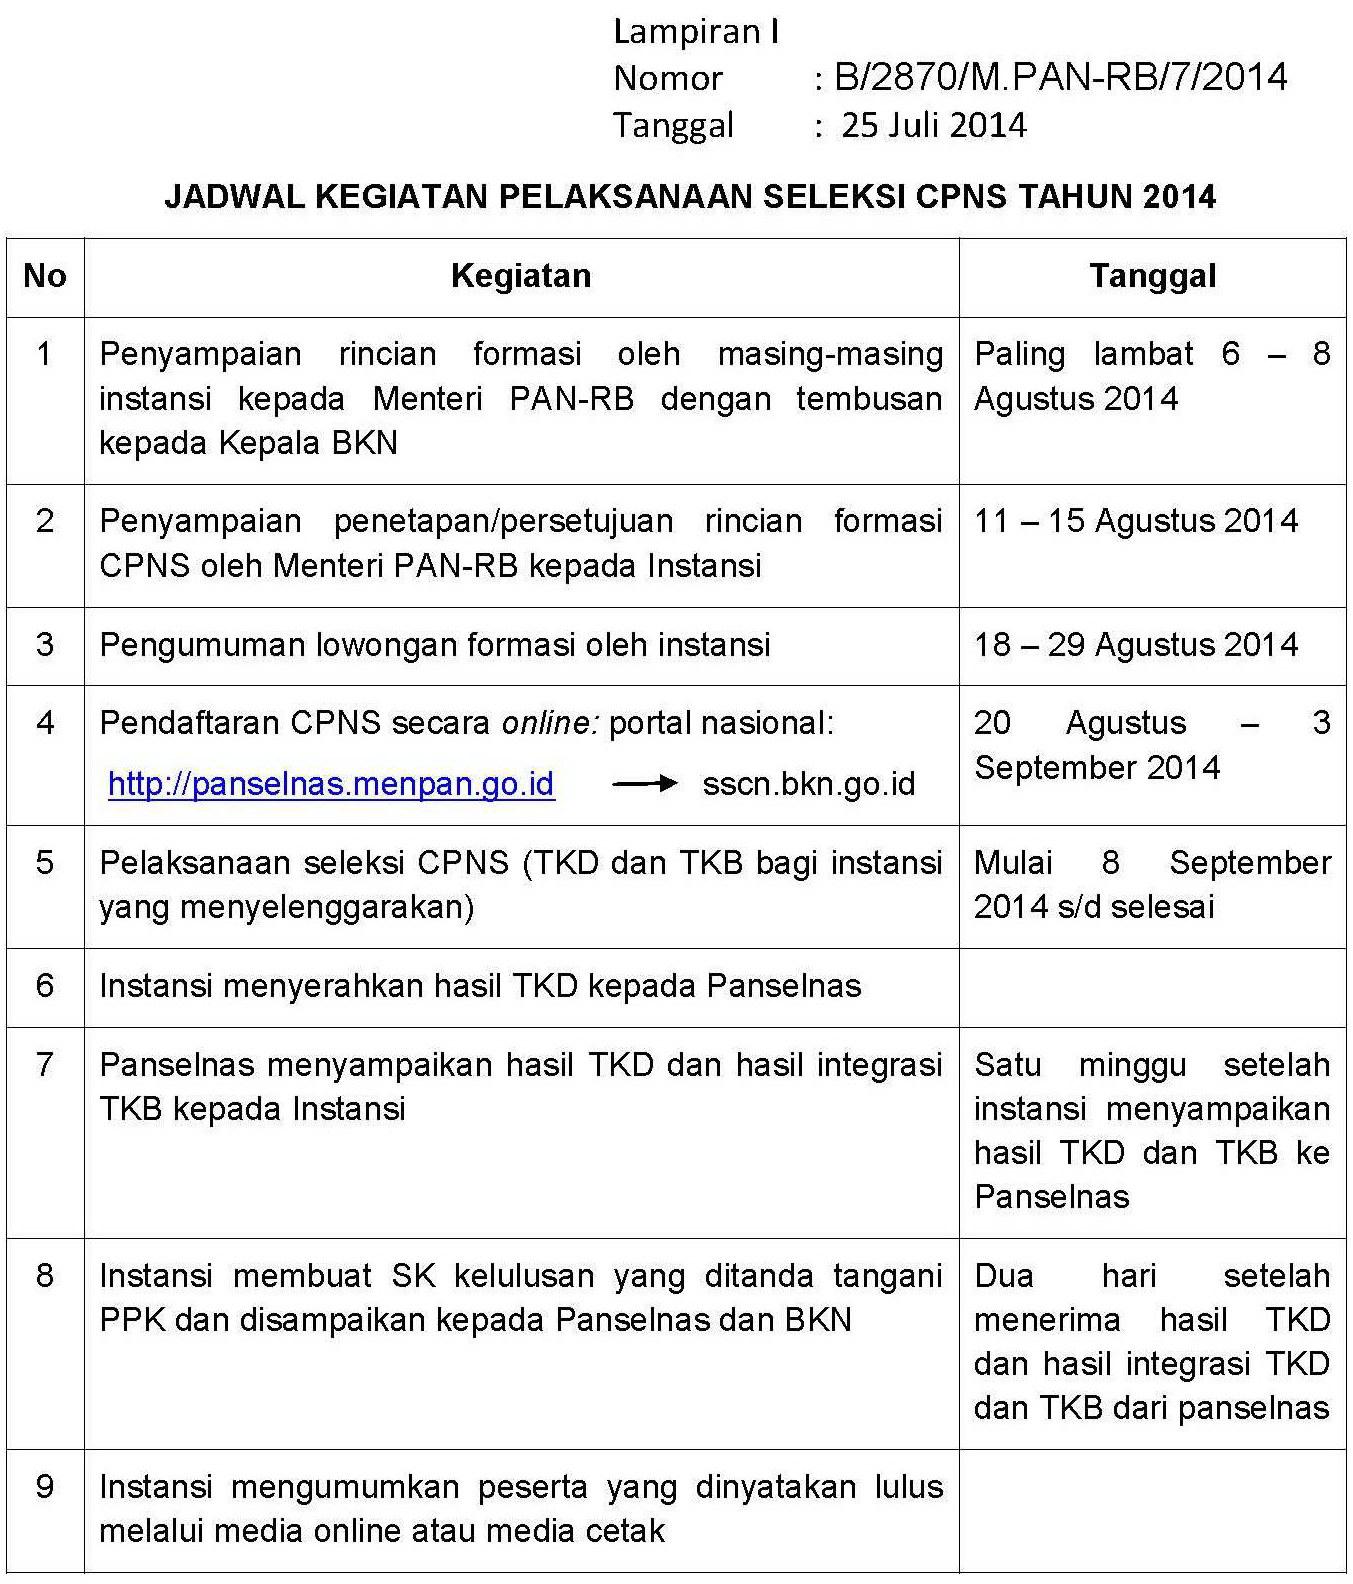 Lowongan Kerja Pt Kereta Api Medan Lowongan Kerja Pt Pertamina Persero Loker Cpns Bumn Lowongan Pt Citilink Indonesia Pusat Info Cpns 2014 Share The